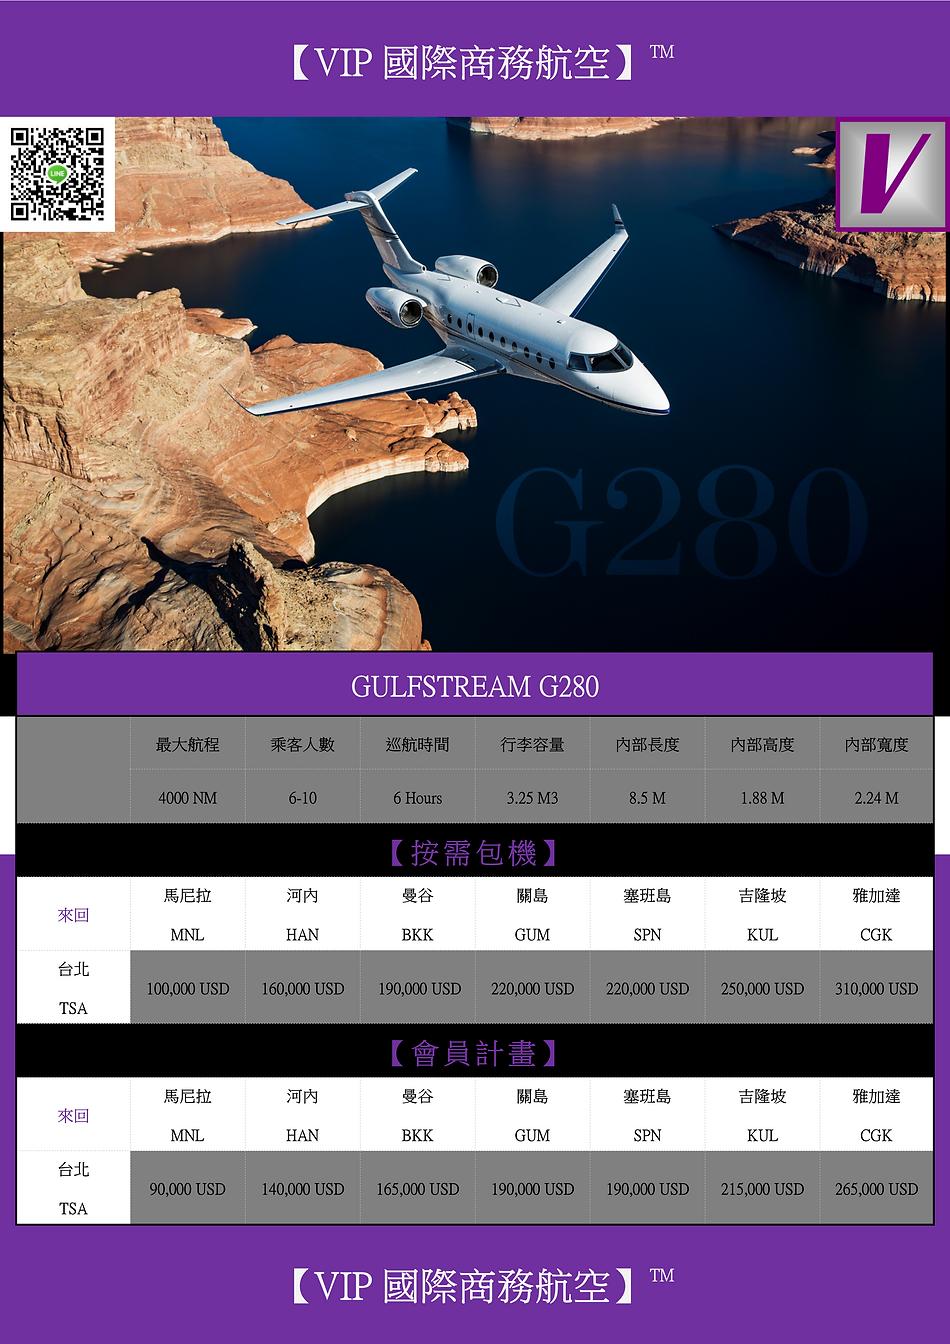 VIP GLOBAL GULFSTREAM G280 DM V3.png